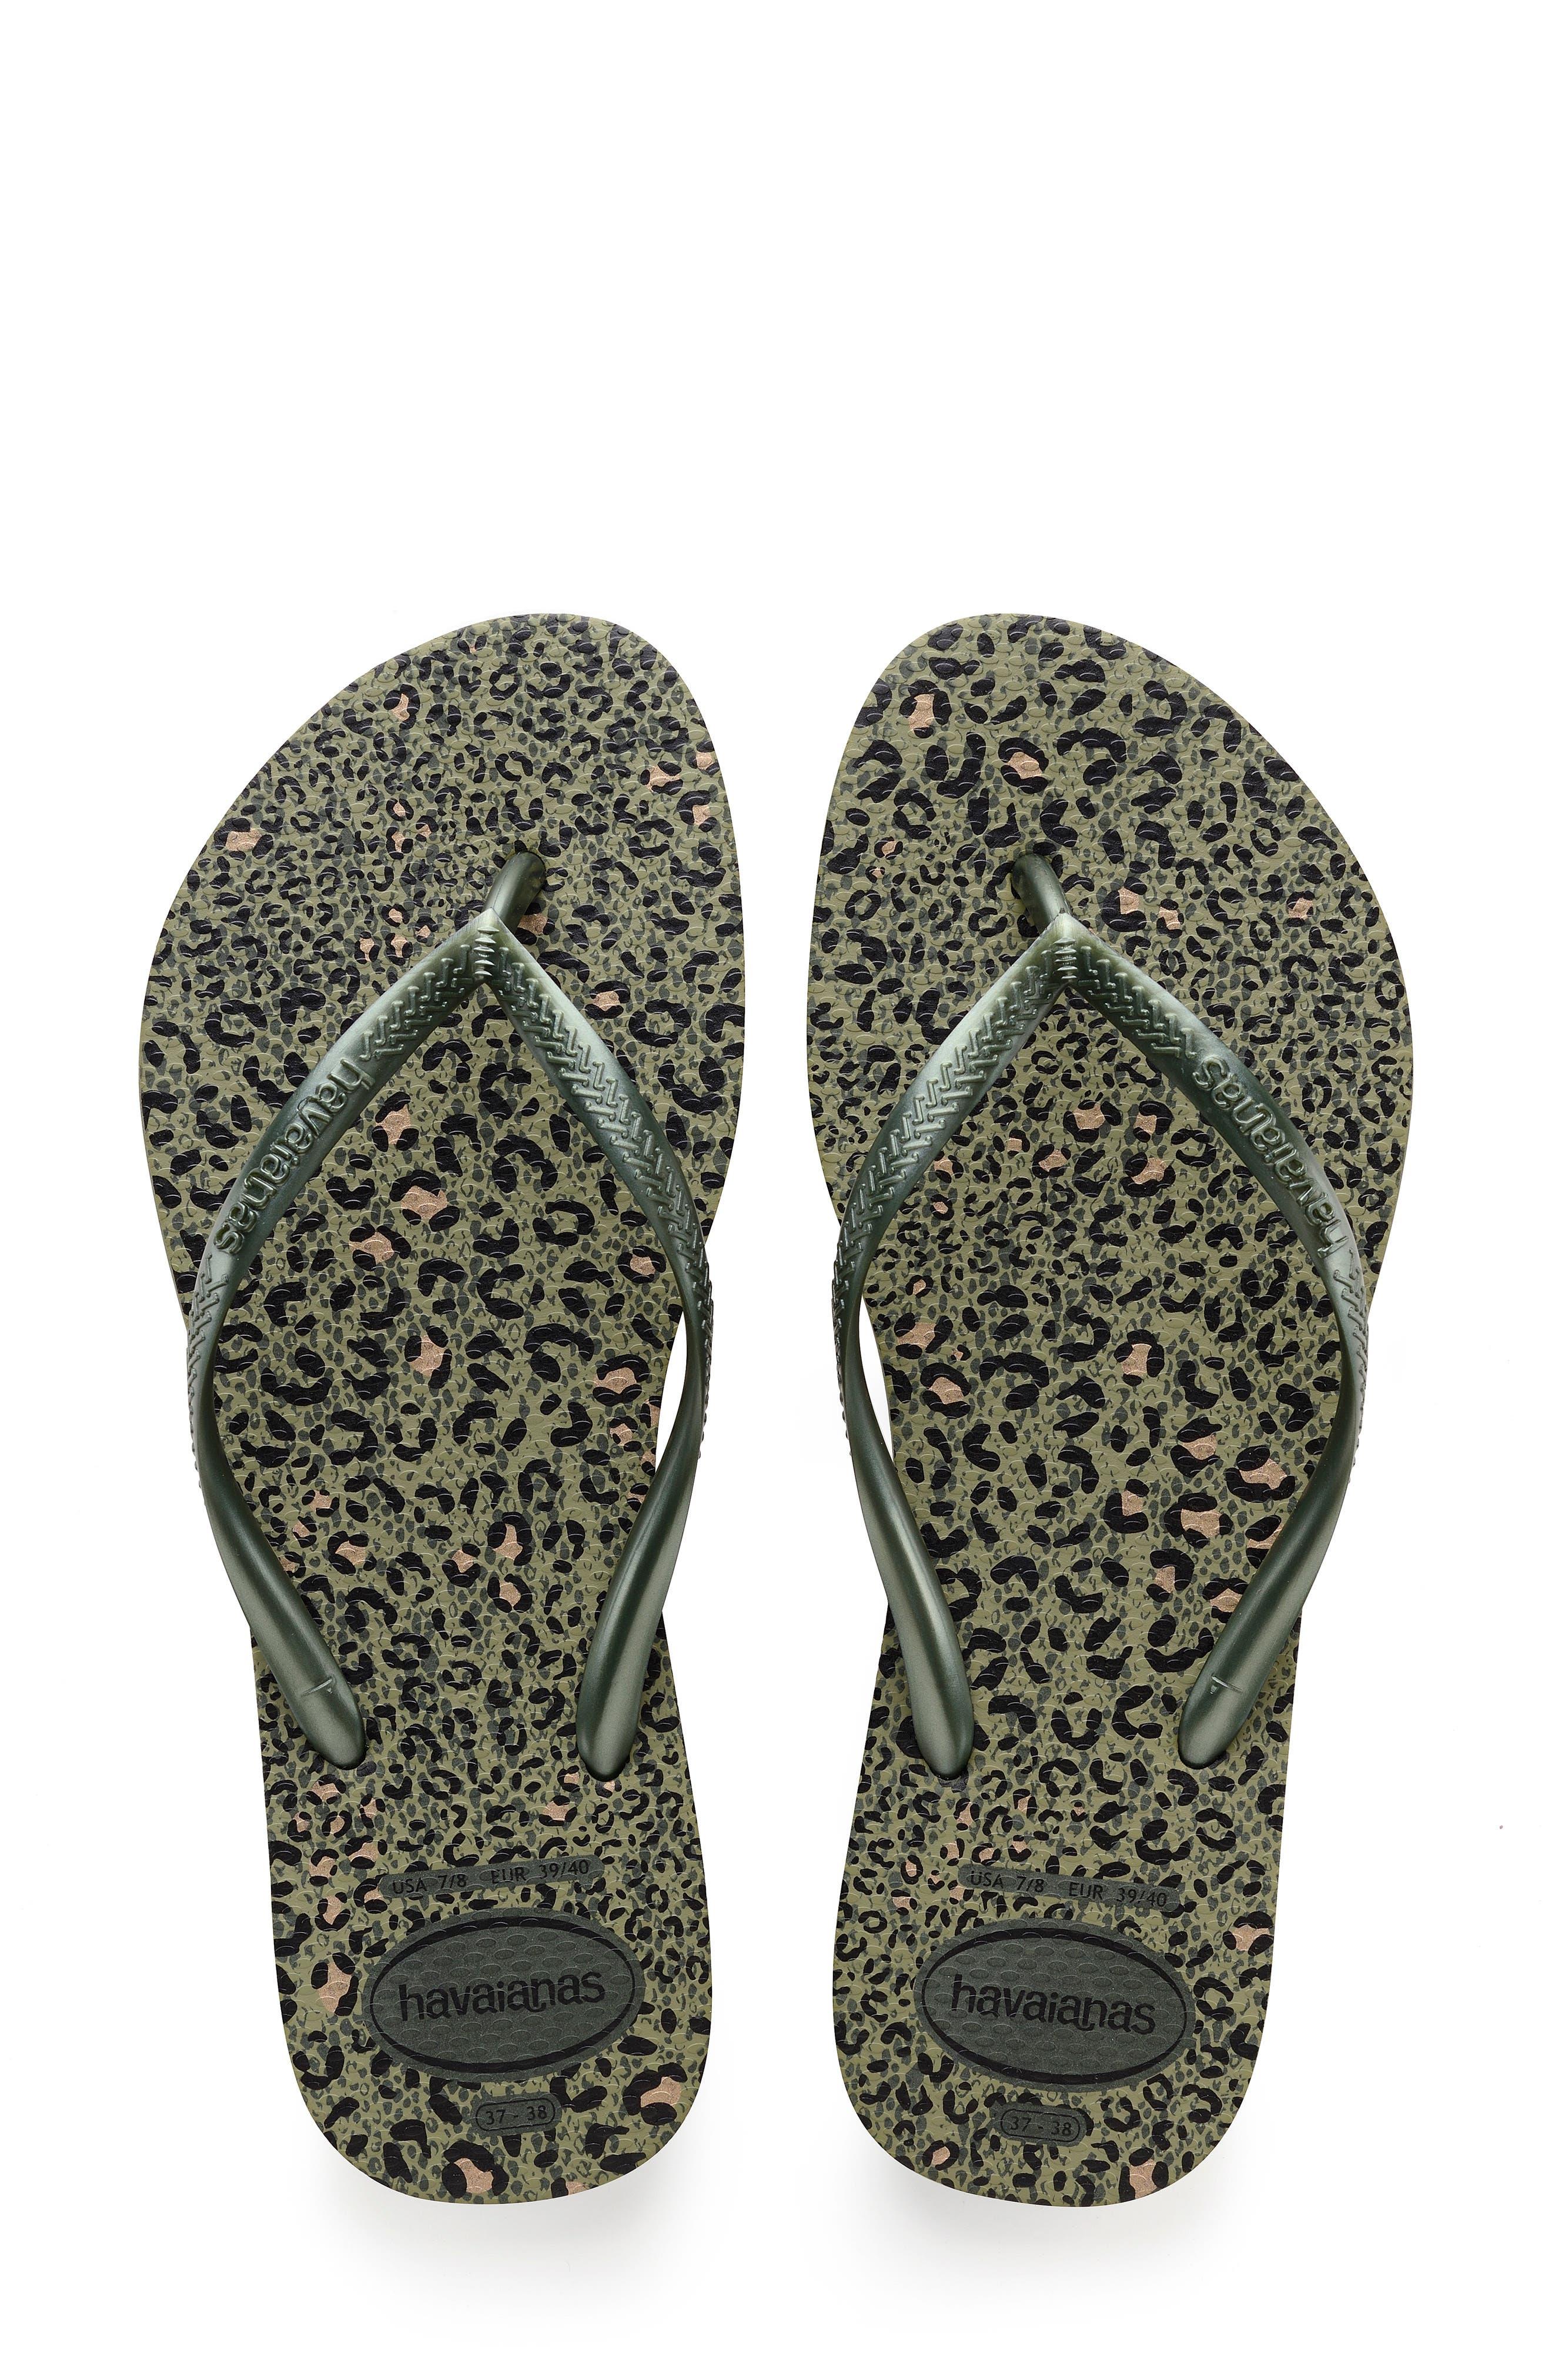 43eeaeaffdac animal print shoes